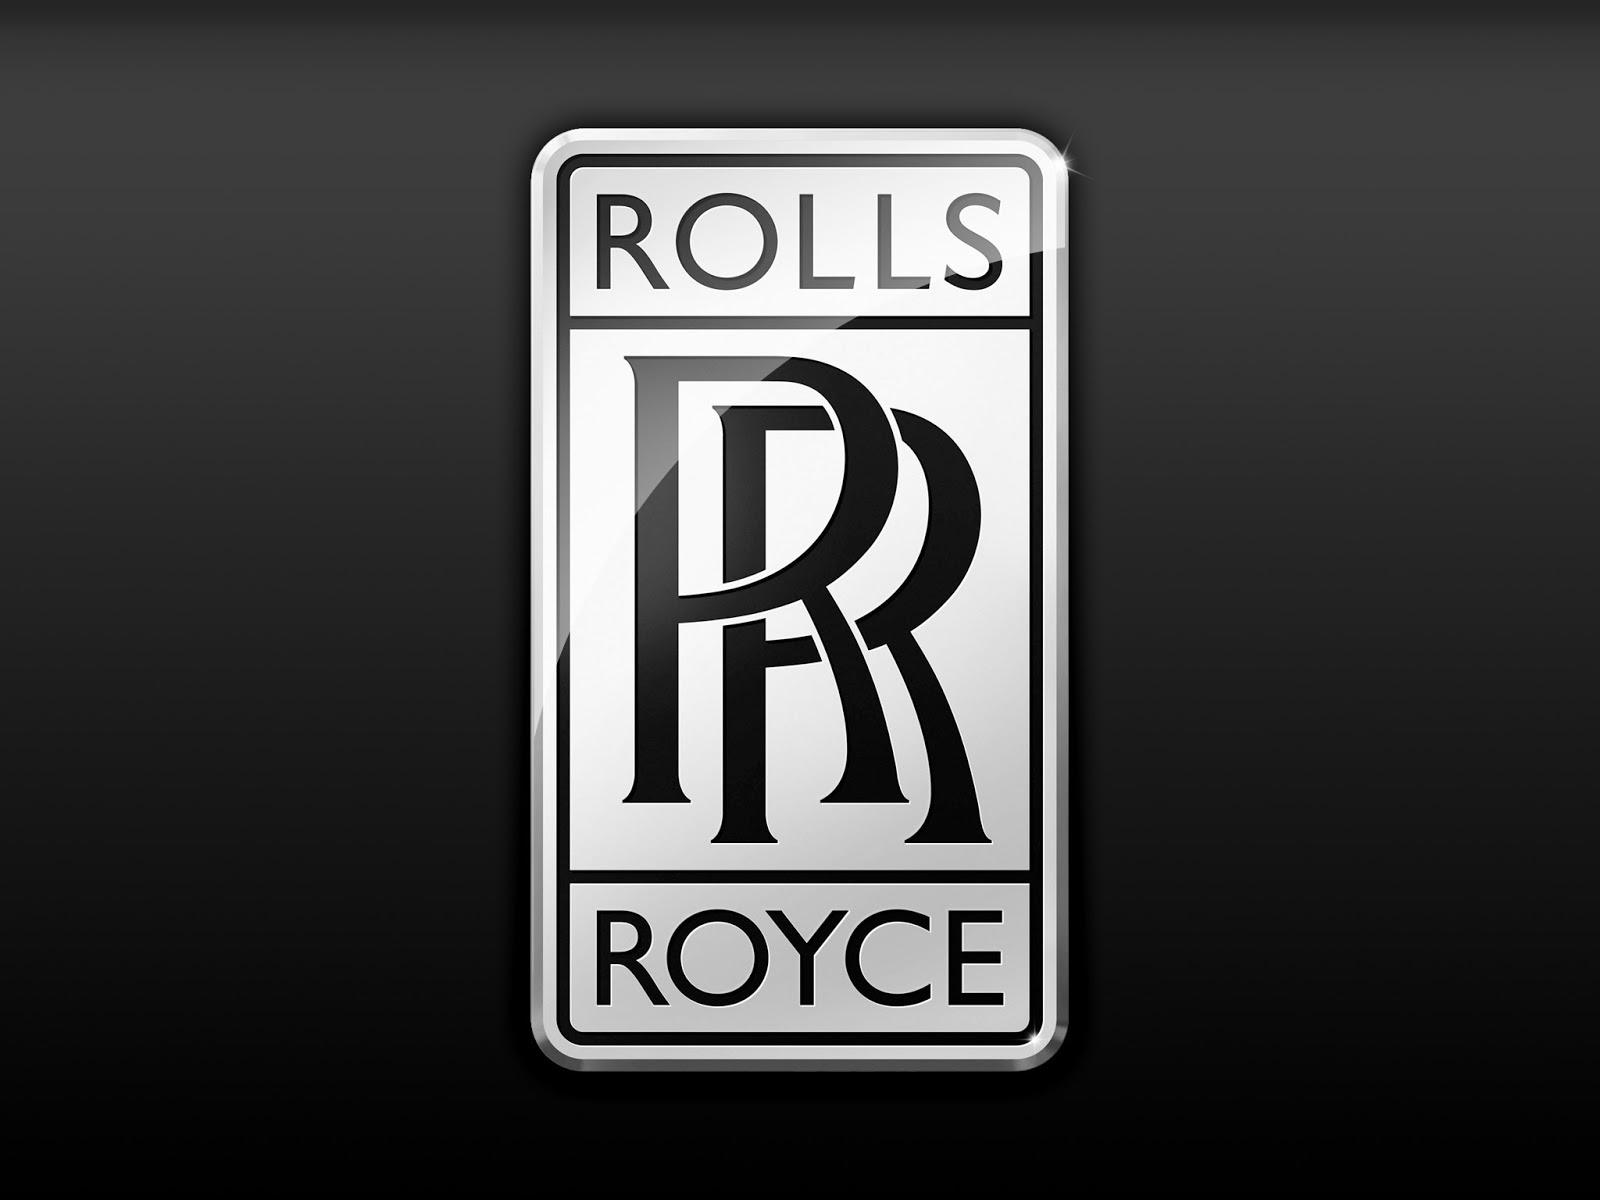 rolls royce logo auto cars concept. Black Bedroom Furniture Sets. Home Design Ideas